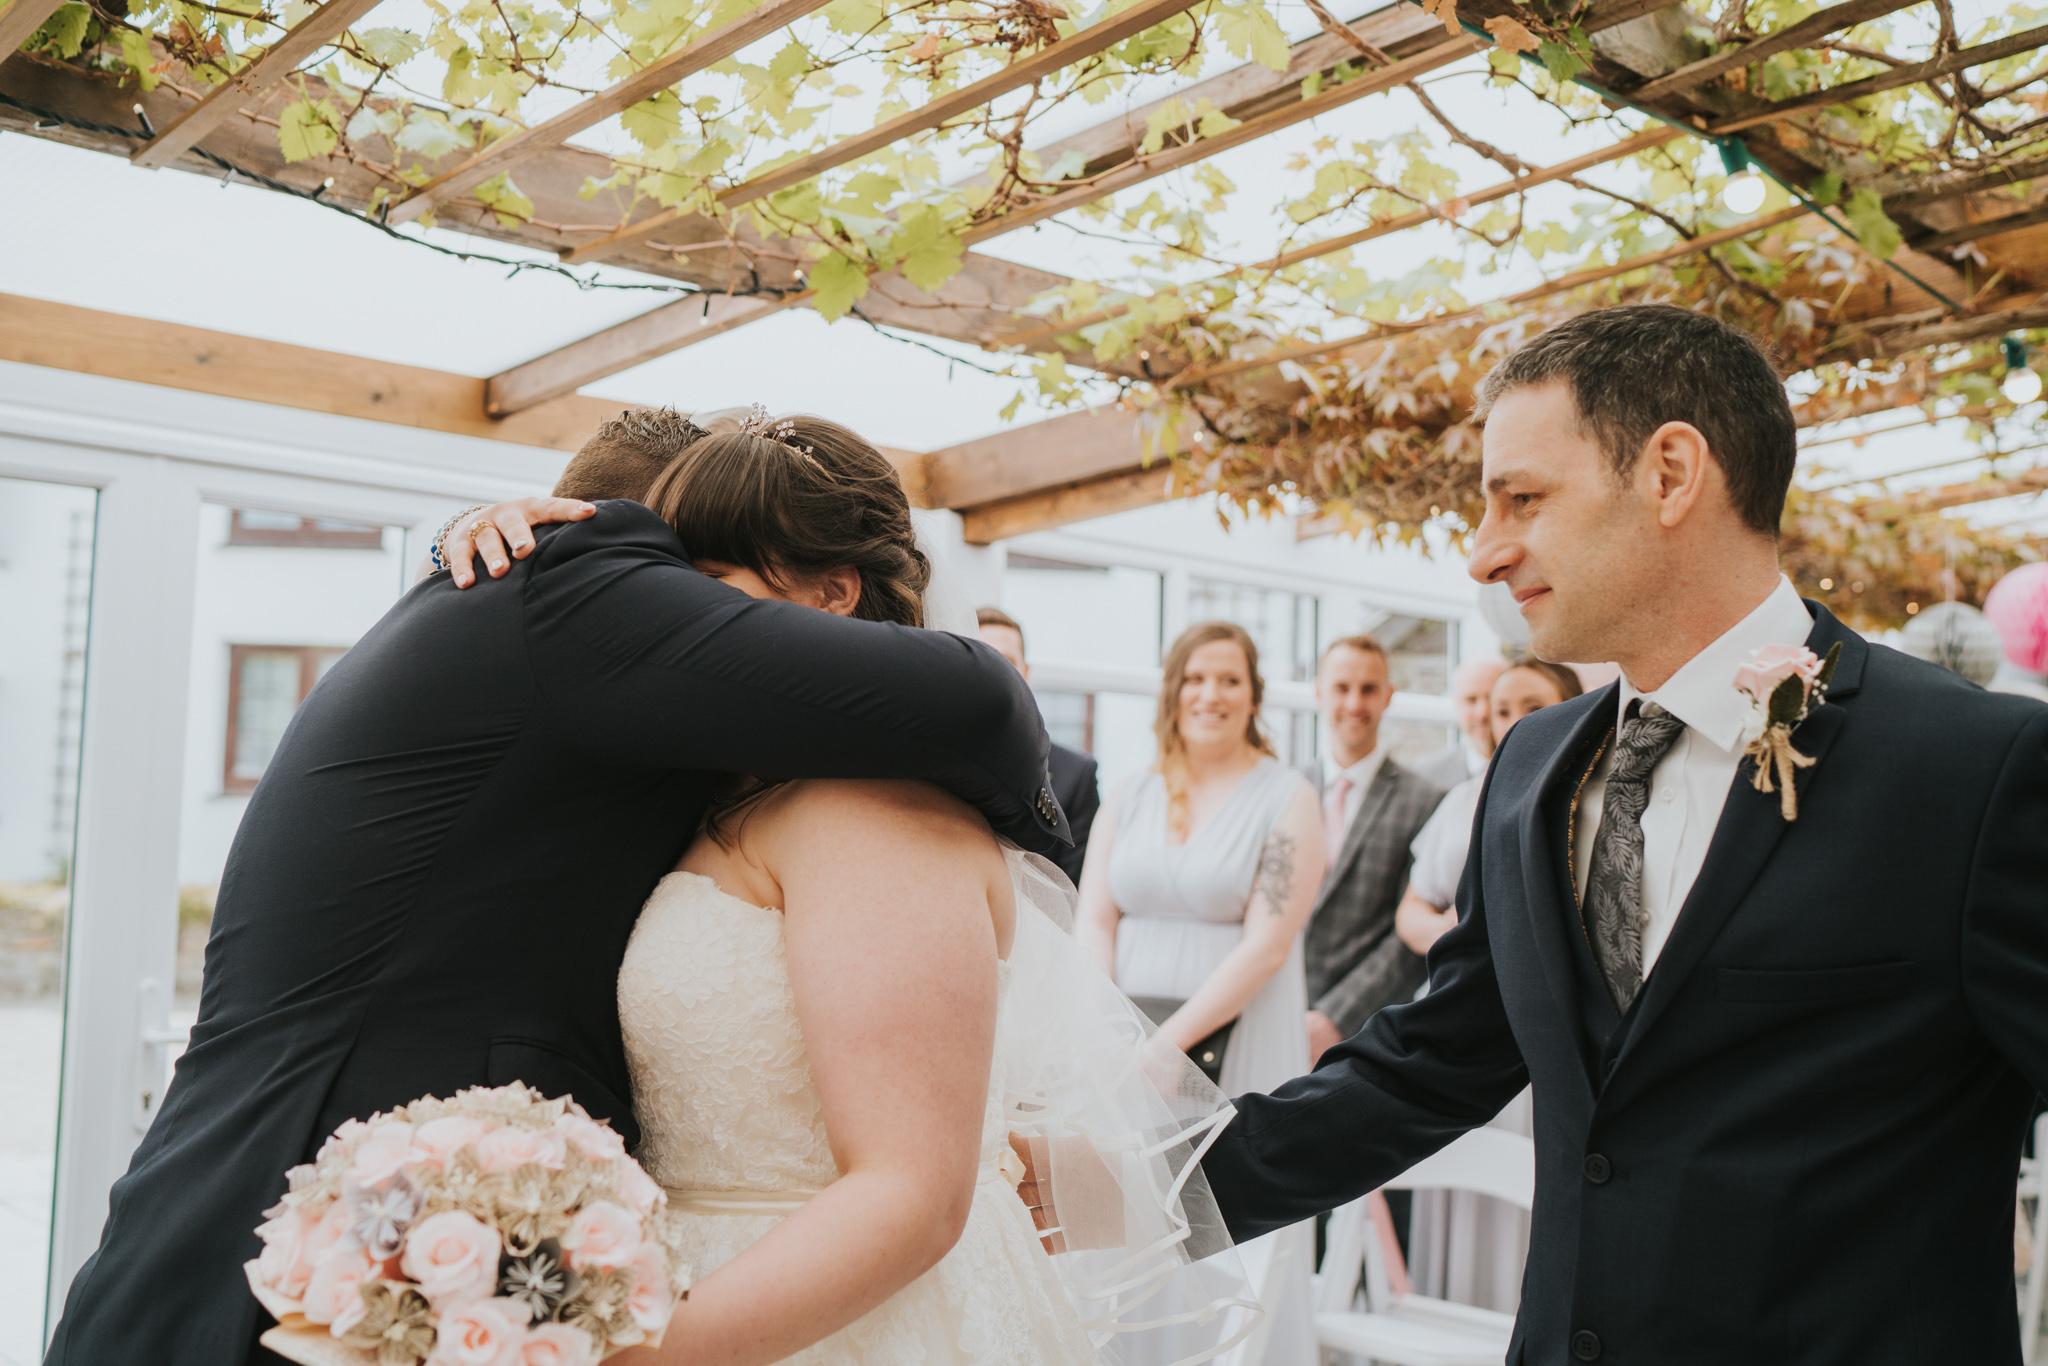 grace-sam-old-barn-clovelly-devon-wedding-photographer-grace-elizabeth-essex-suffolk-norfolk-wedding-photographer (46 of 132).jpg